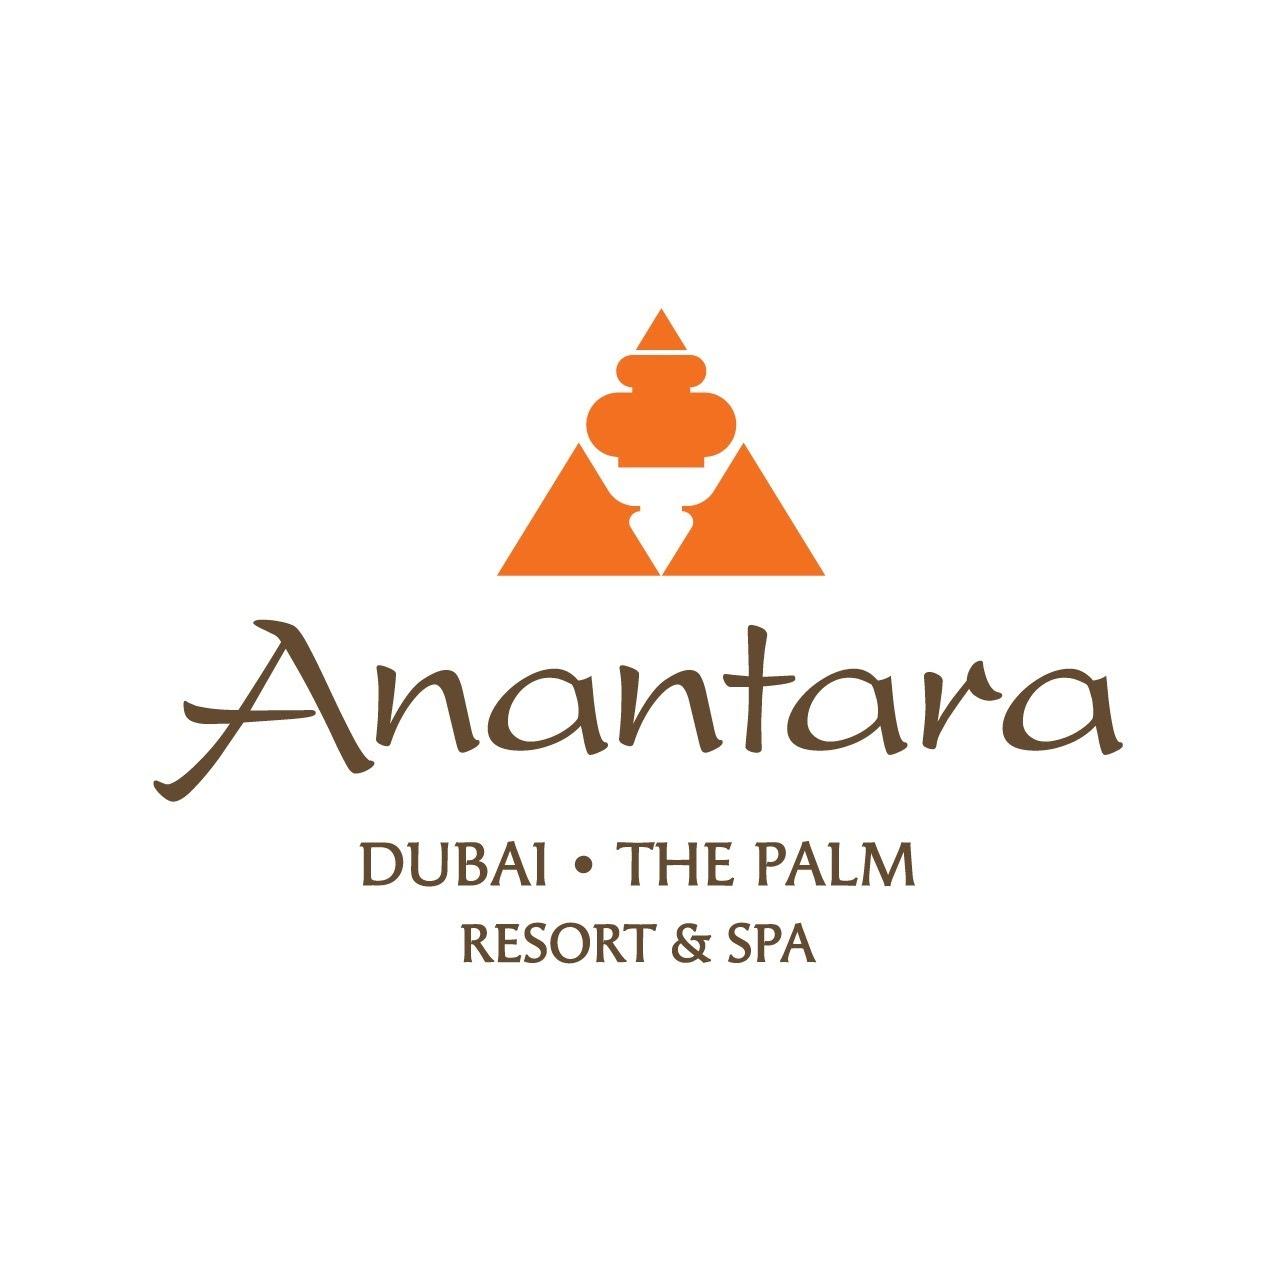 Anantara_Dubai_The_Palm_Resort_Spa_CW